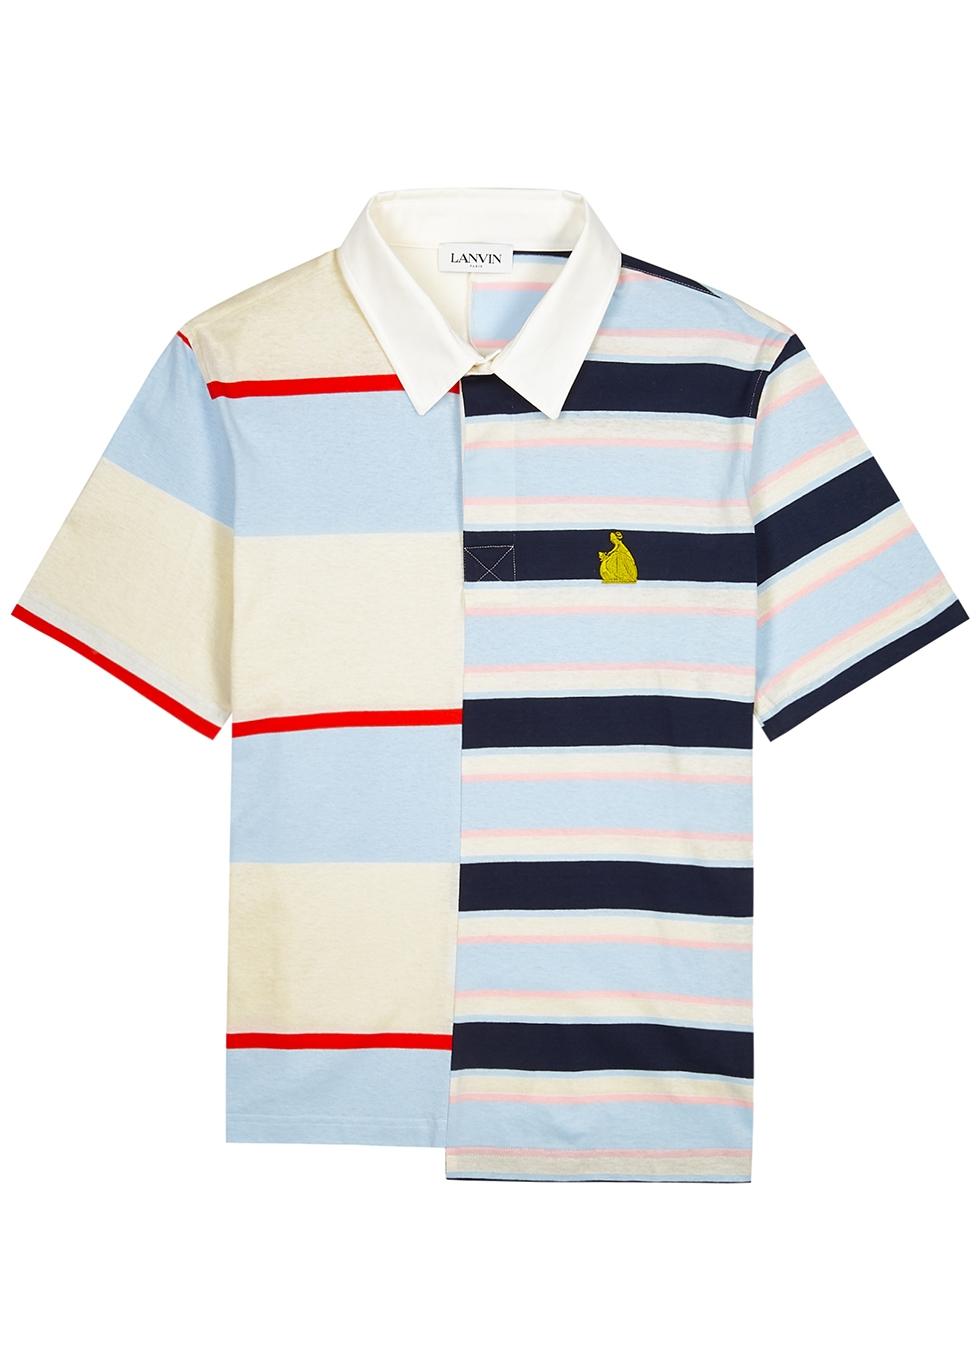 Men's Designer Polo Shirts - Polo Shirts For Men - Harvey Nichols